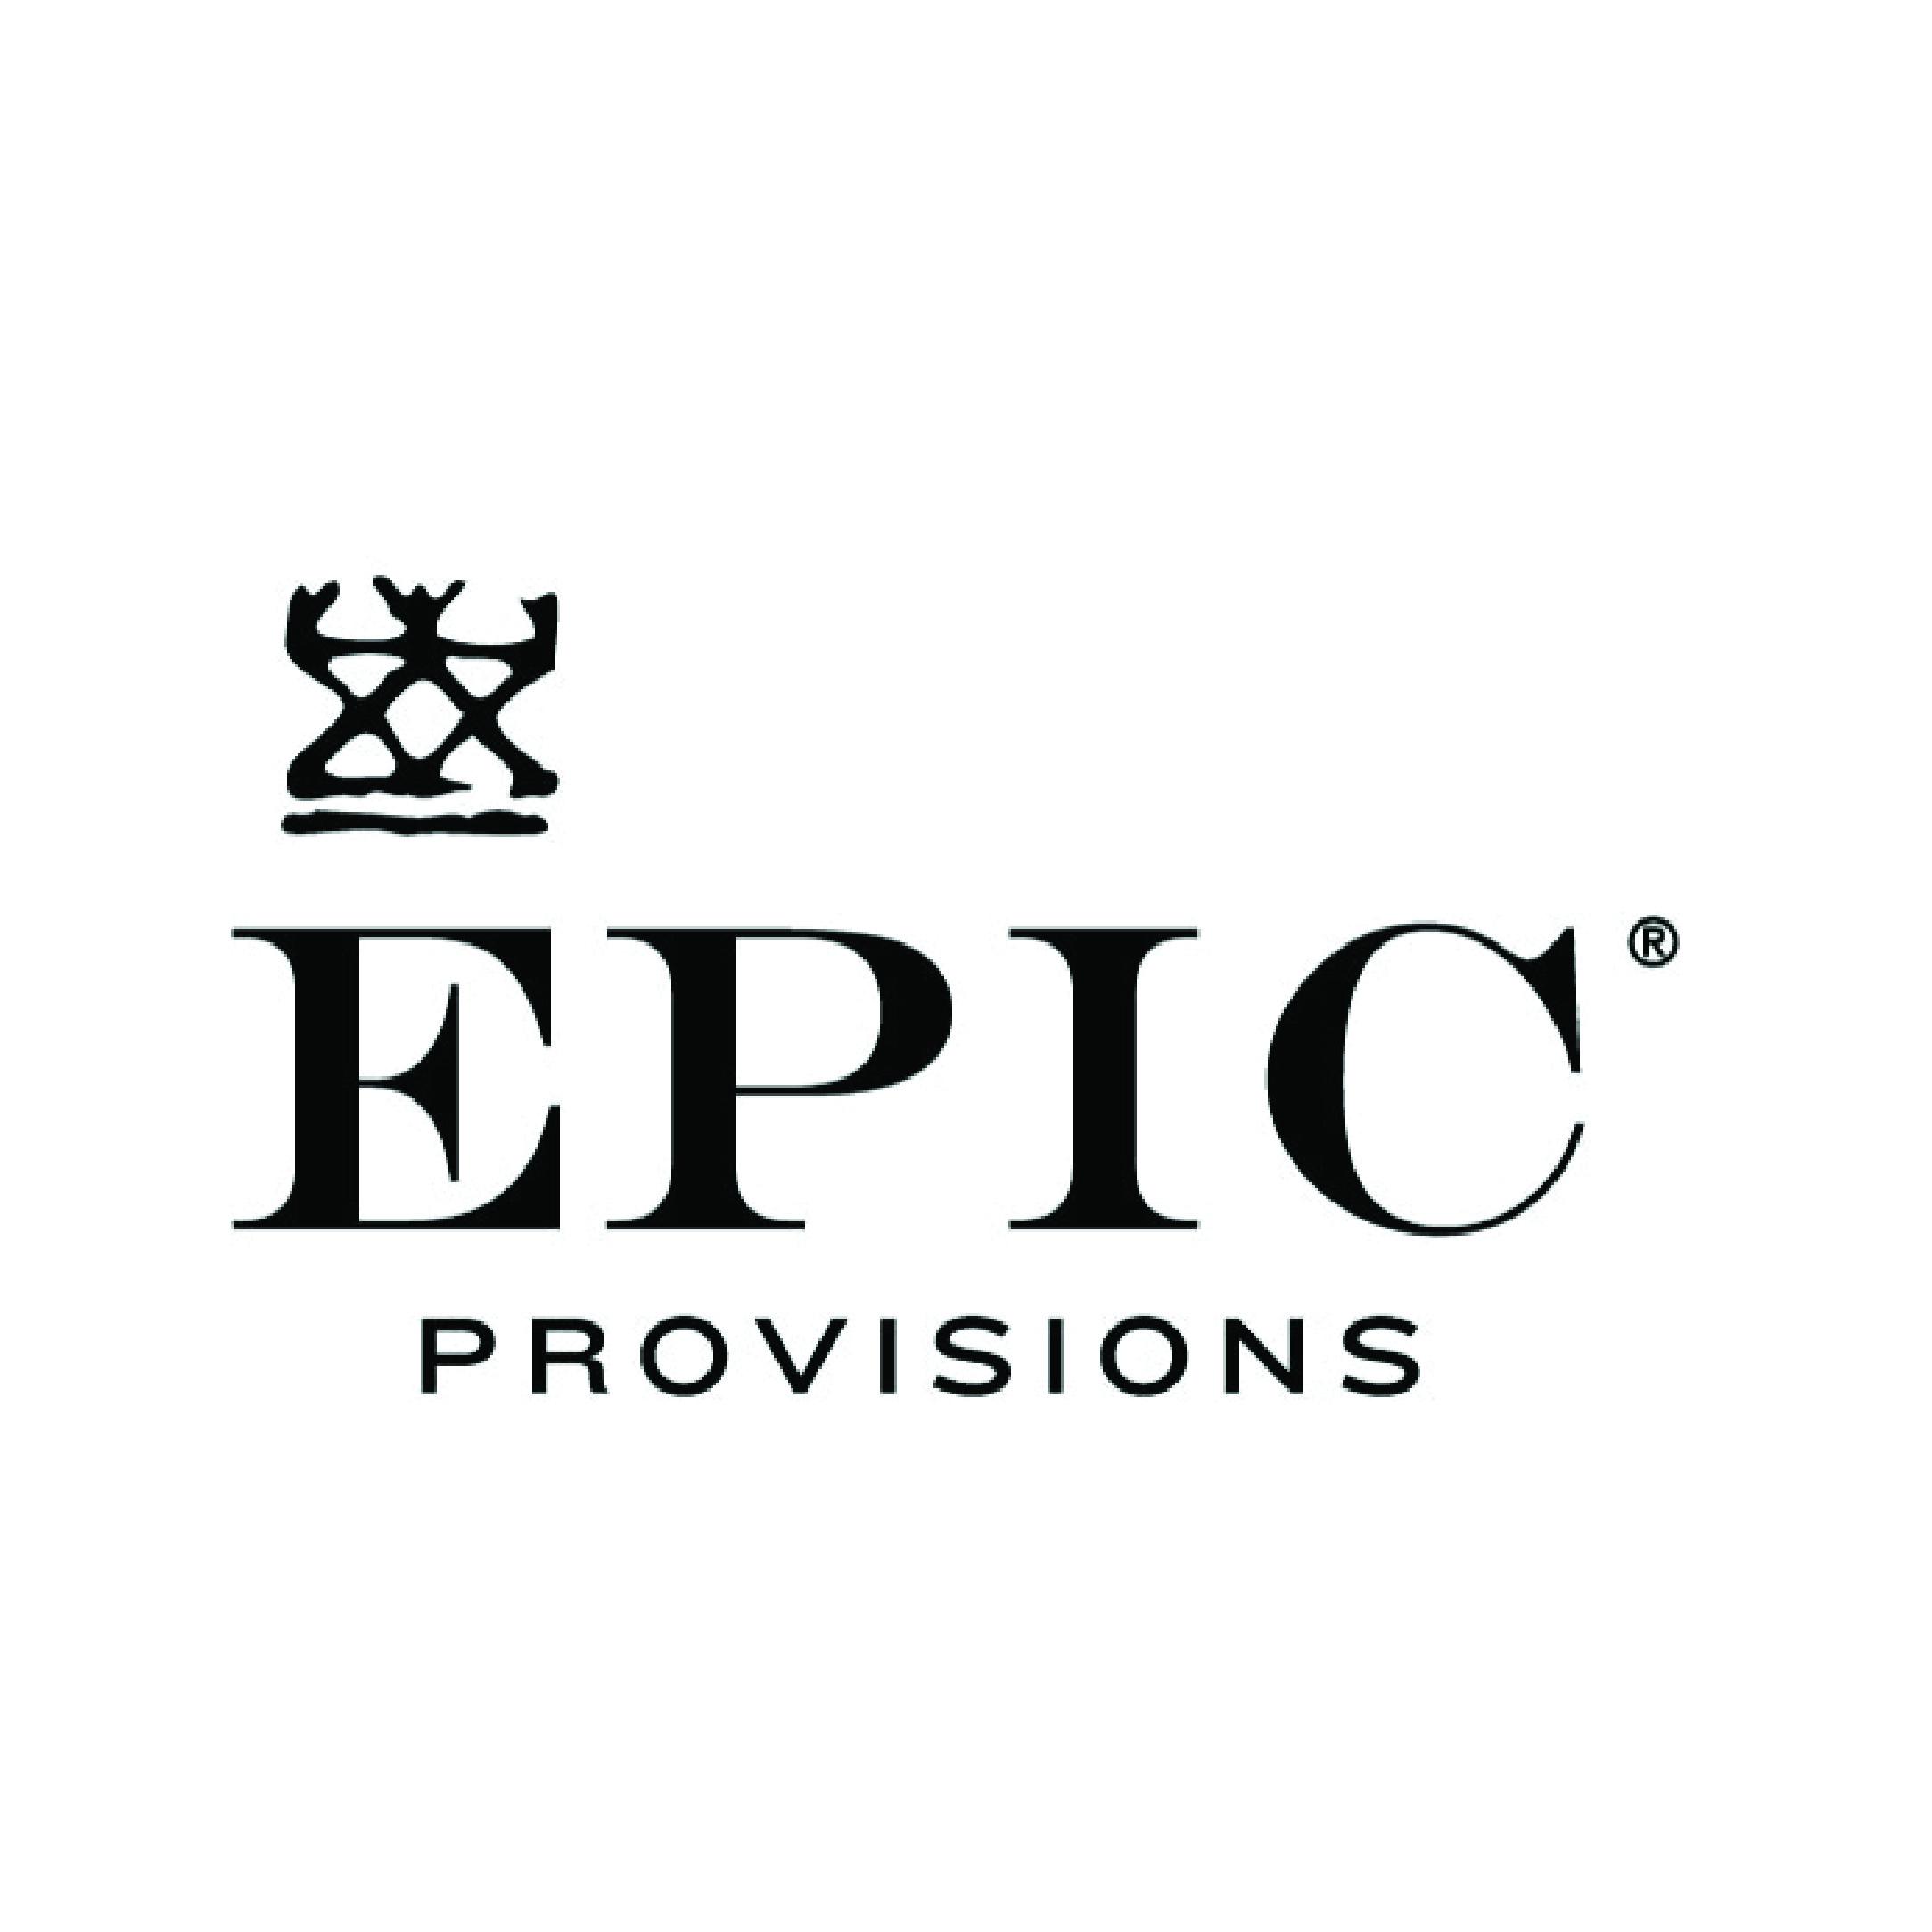 Epic Provisions